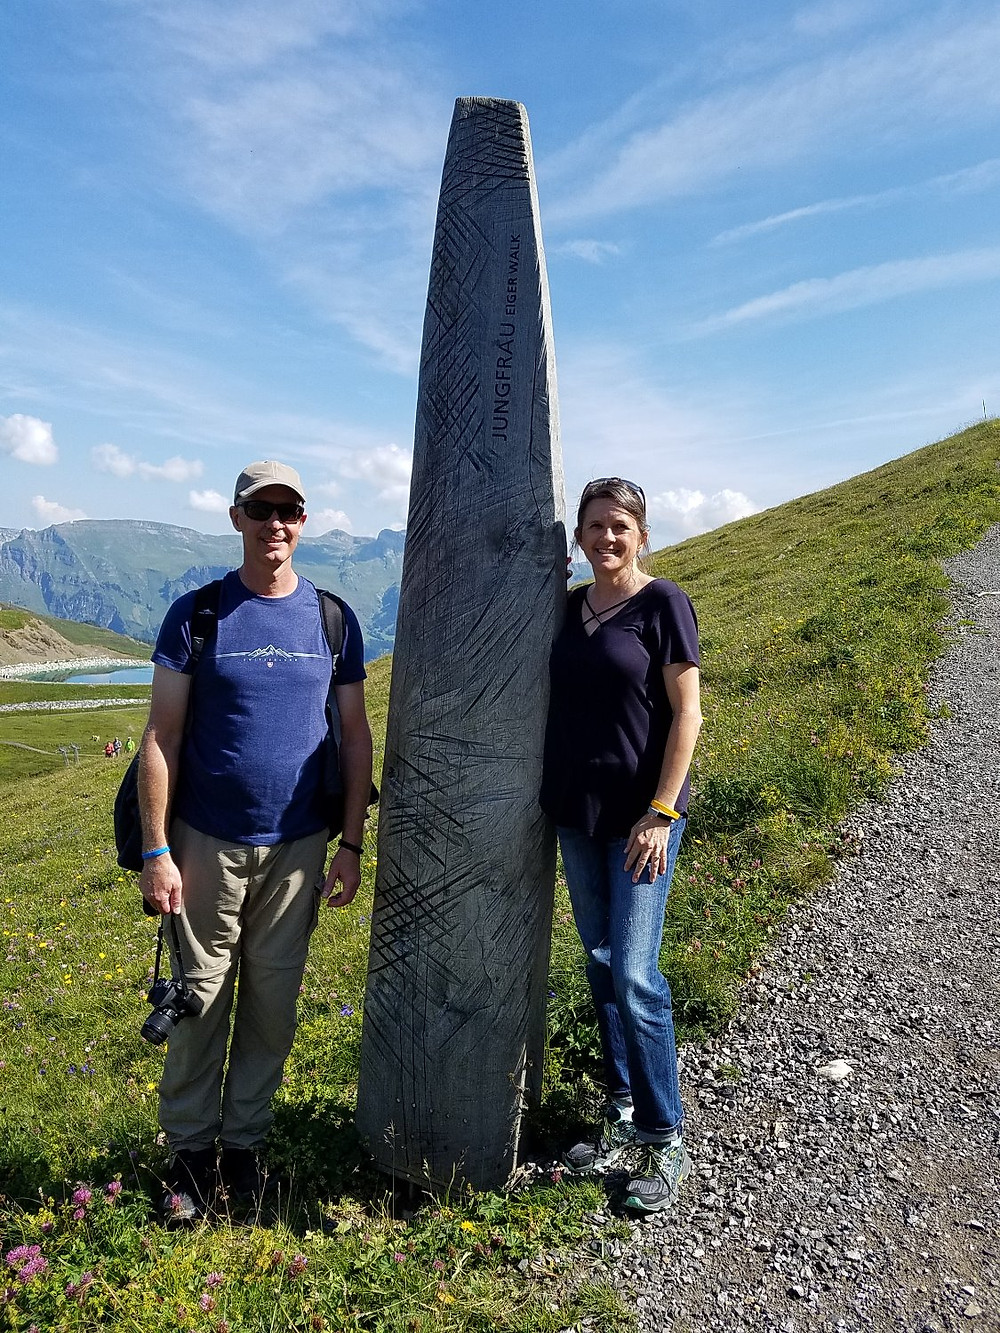 Hiking on Eiger